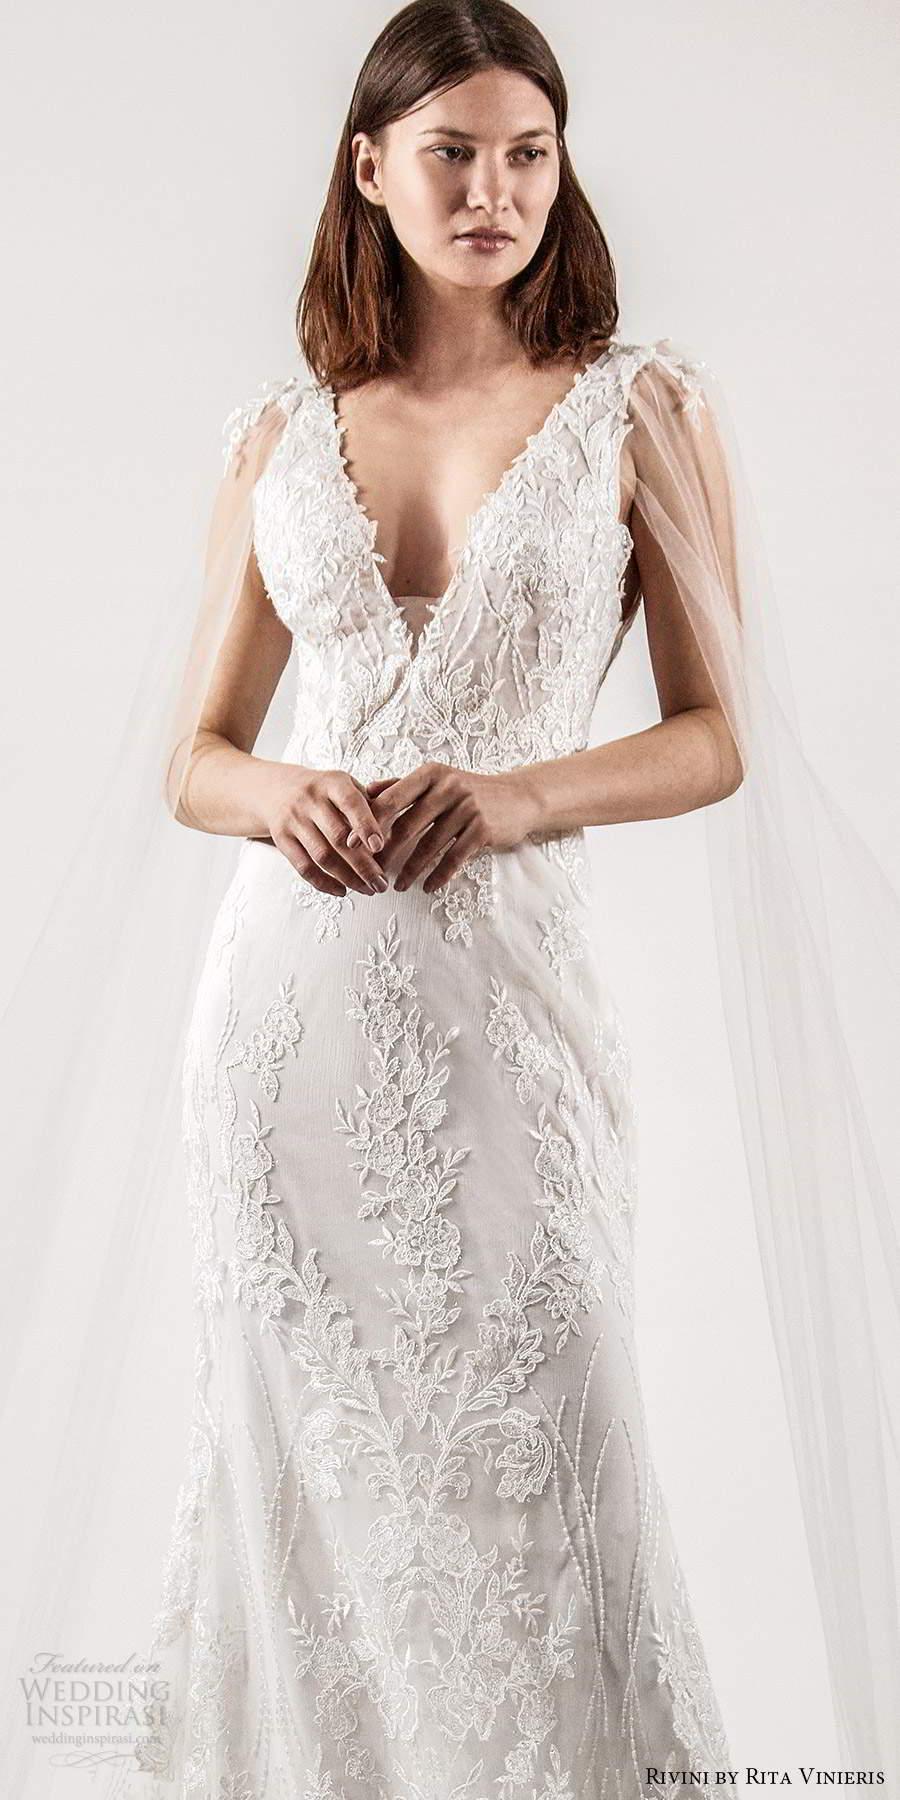 rivini rita vinieris spring 2021 bridal illusion split long sleeves thick straps plunging v neckline fully embellished lace sheath wedding dress chapel train (5) lv